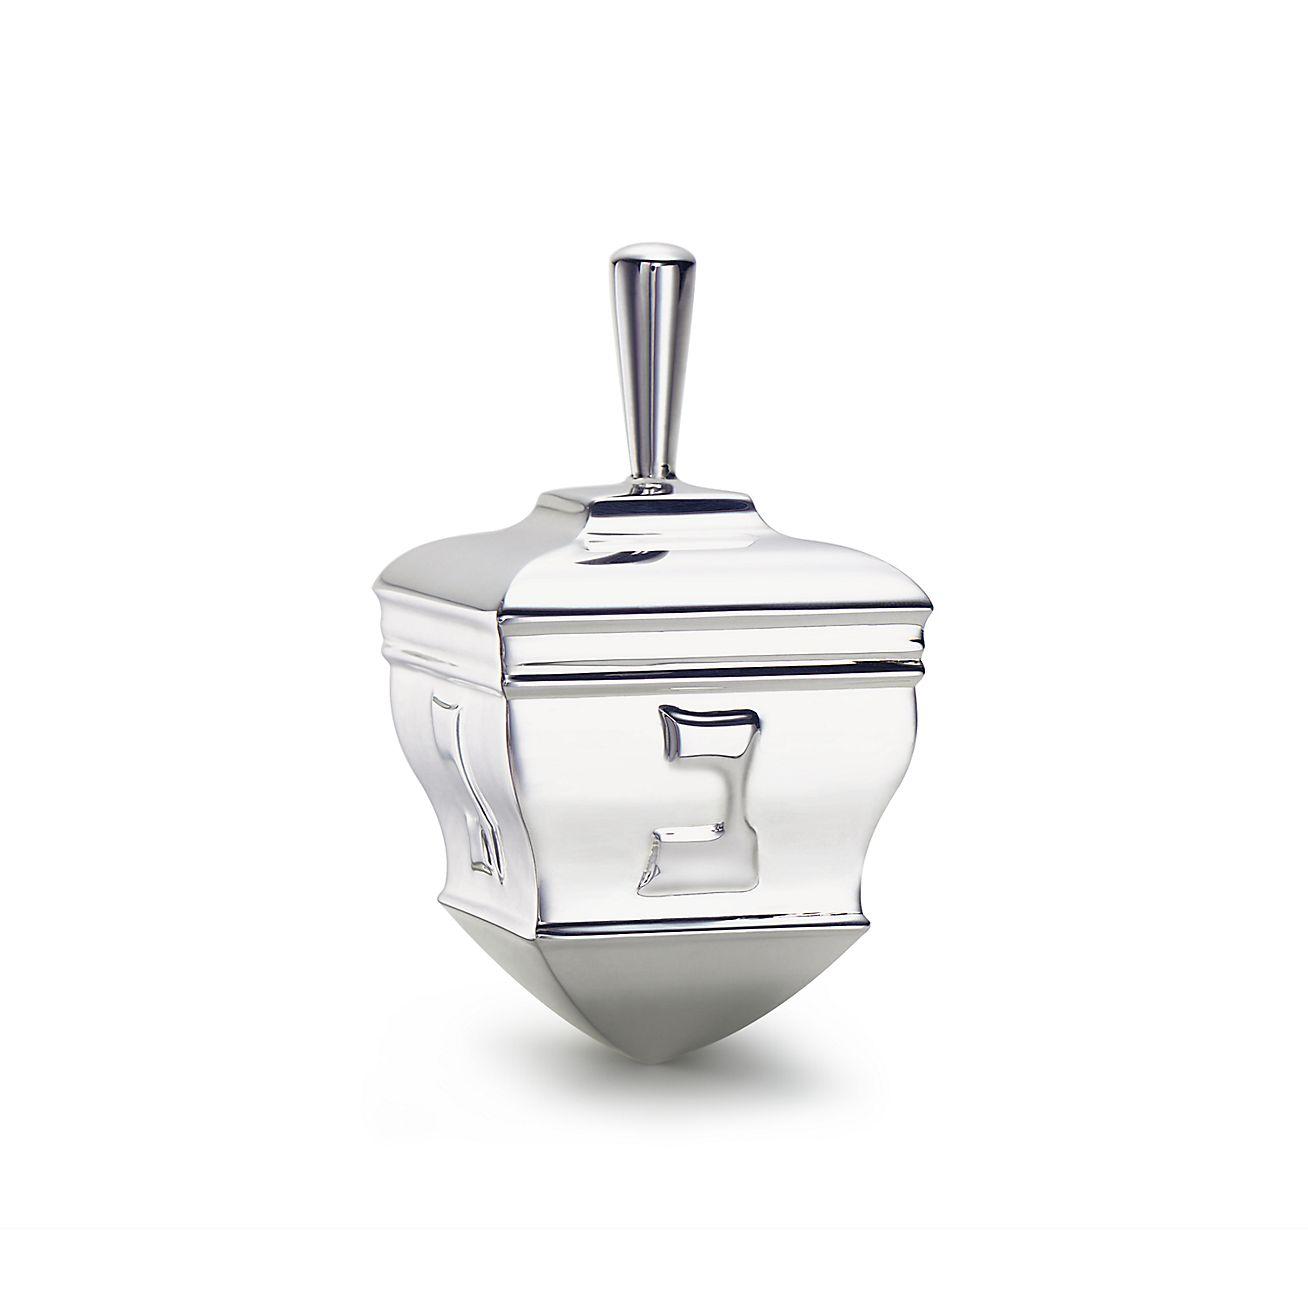 http://www.tiffany.com/accessories/silver-accessories/dreidel-17246402#p+1-n+1000-c+-s+-r+-t+-ni+1-x+-pu+-f+false+0-lr+-hr+-ri+-mi+-pp+